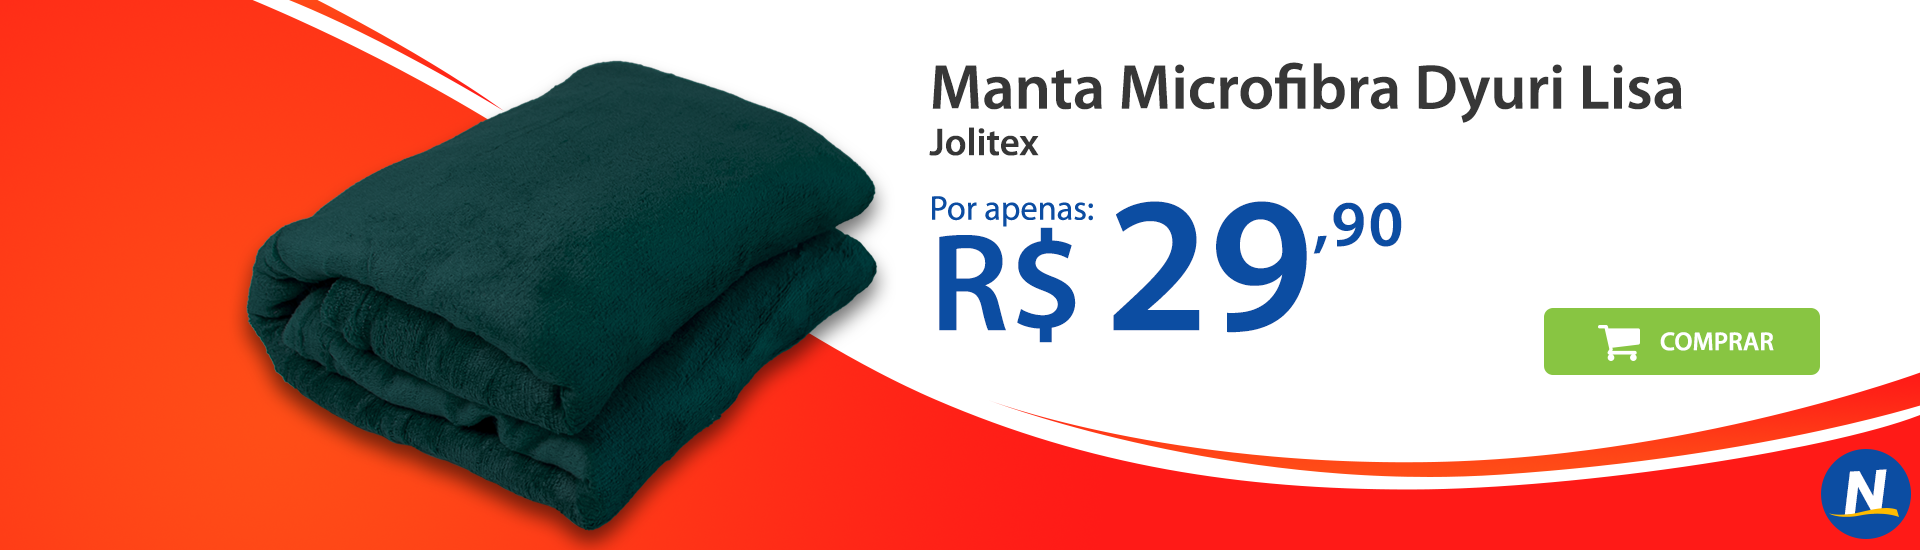 banner manta jolitex